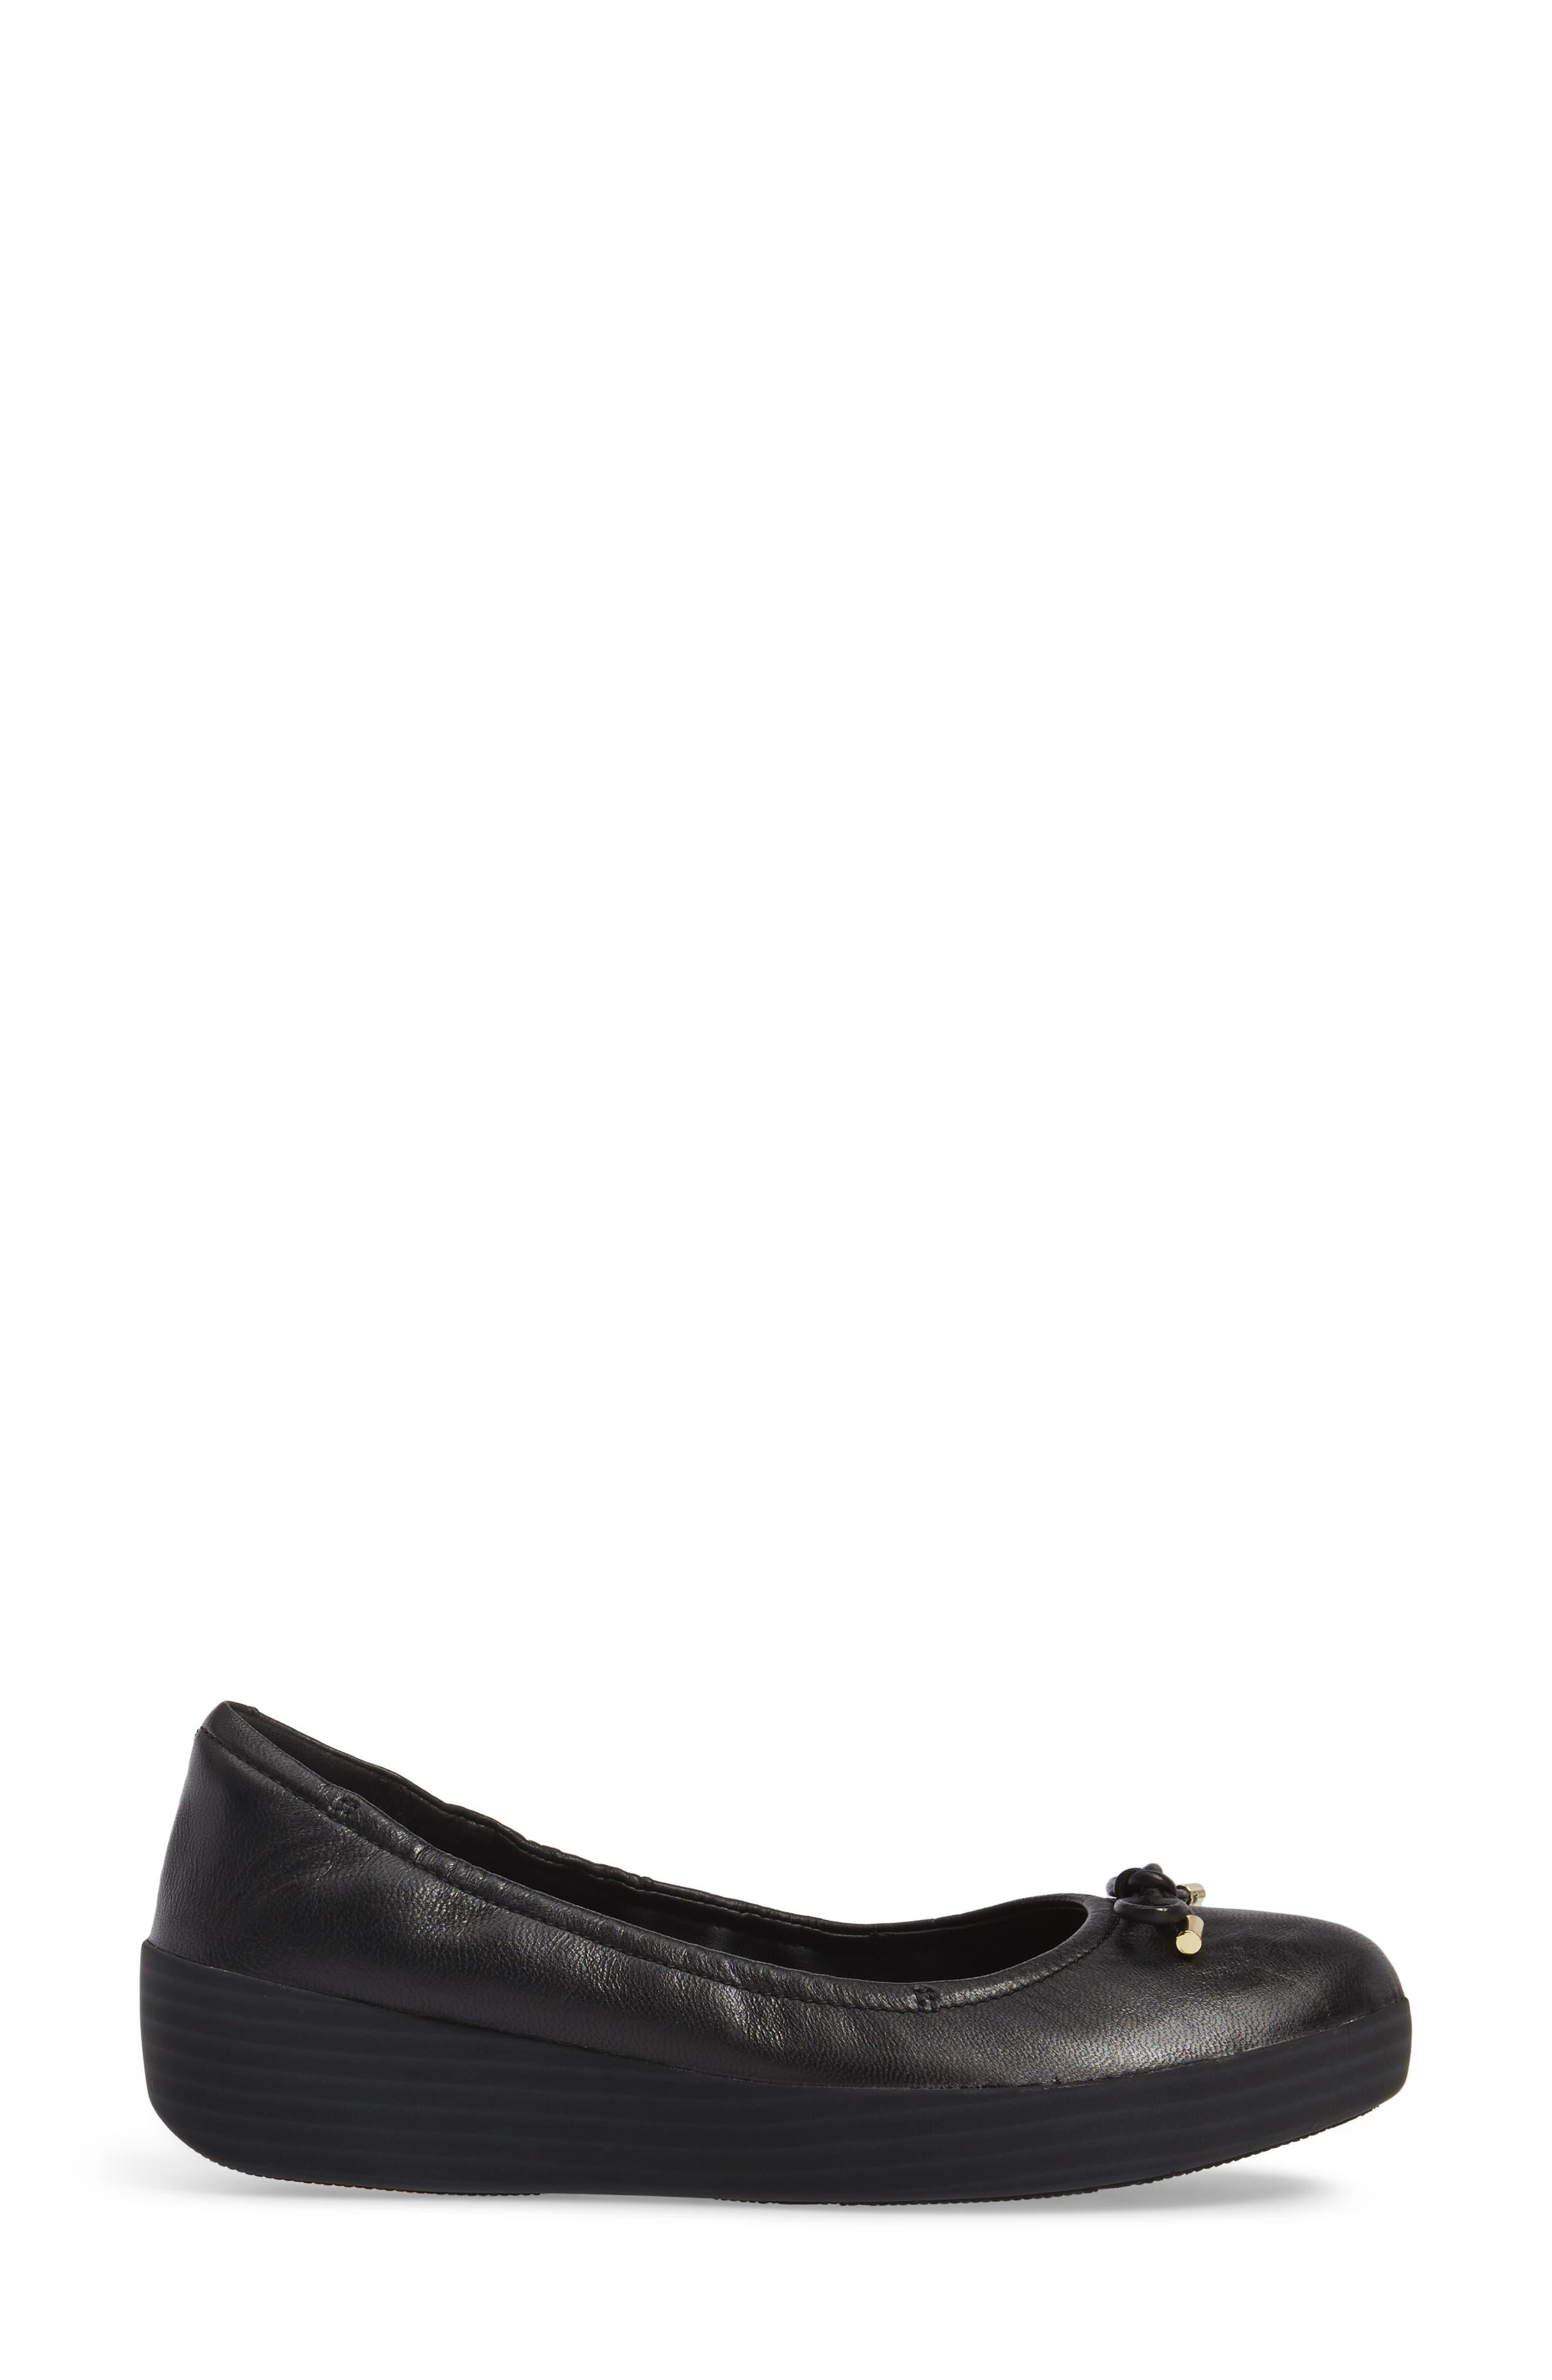 Superbendy Ballerina Flat,                             Alternate thumbnail 3, color,                             Black Leather